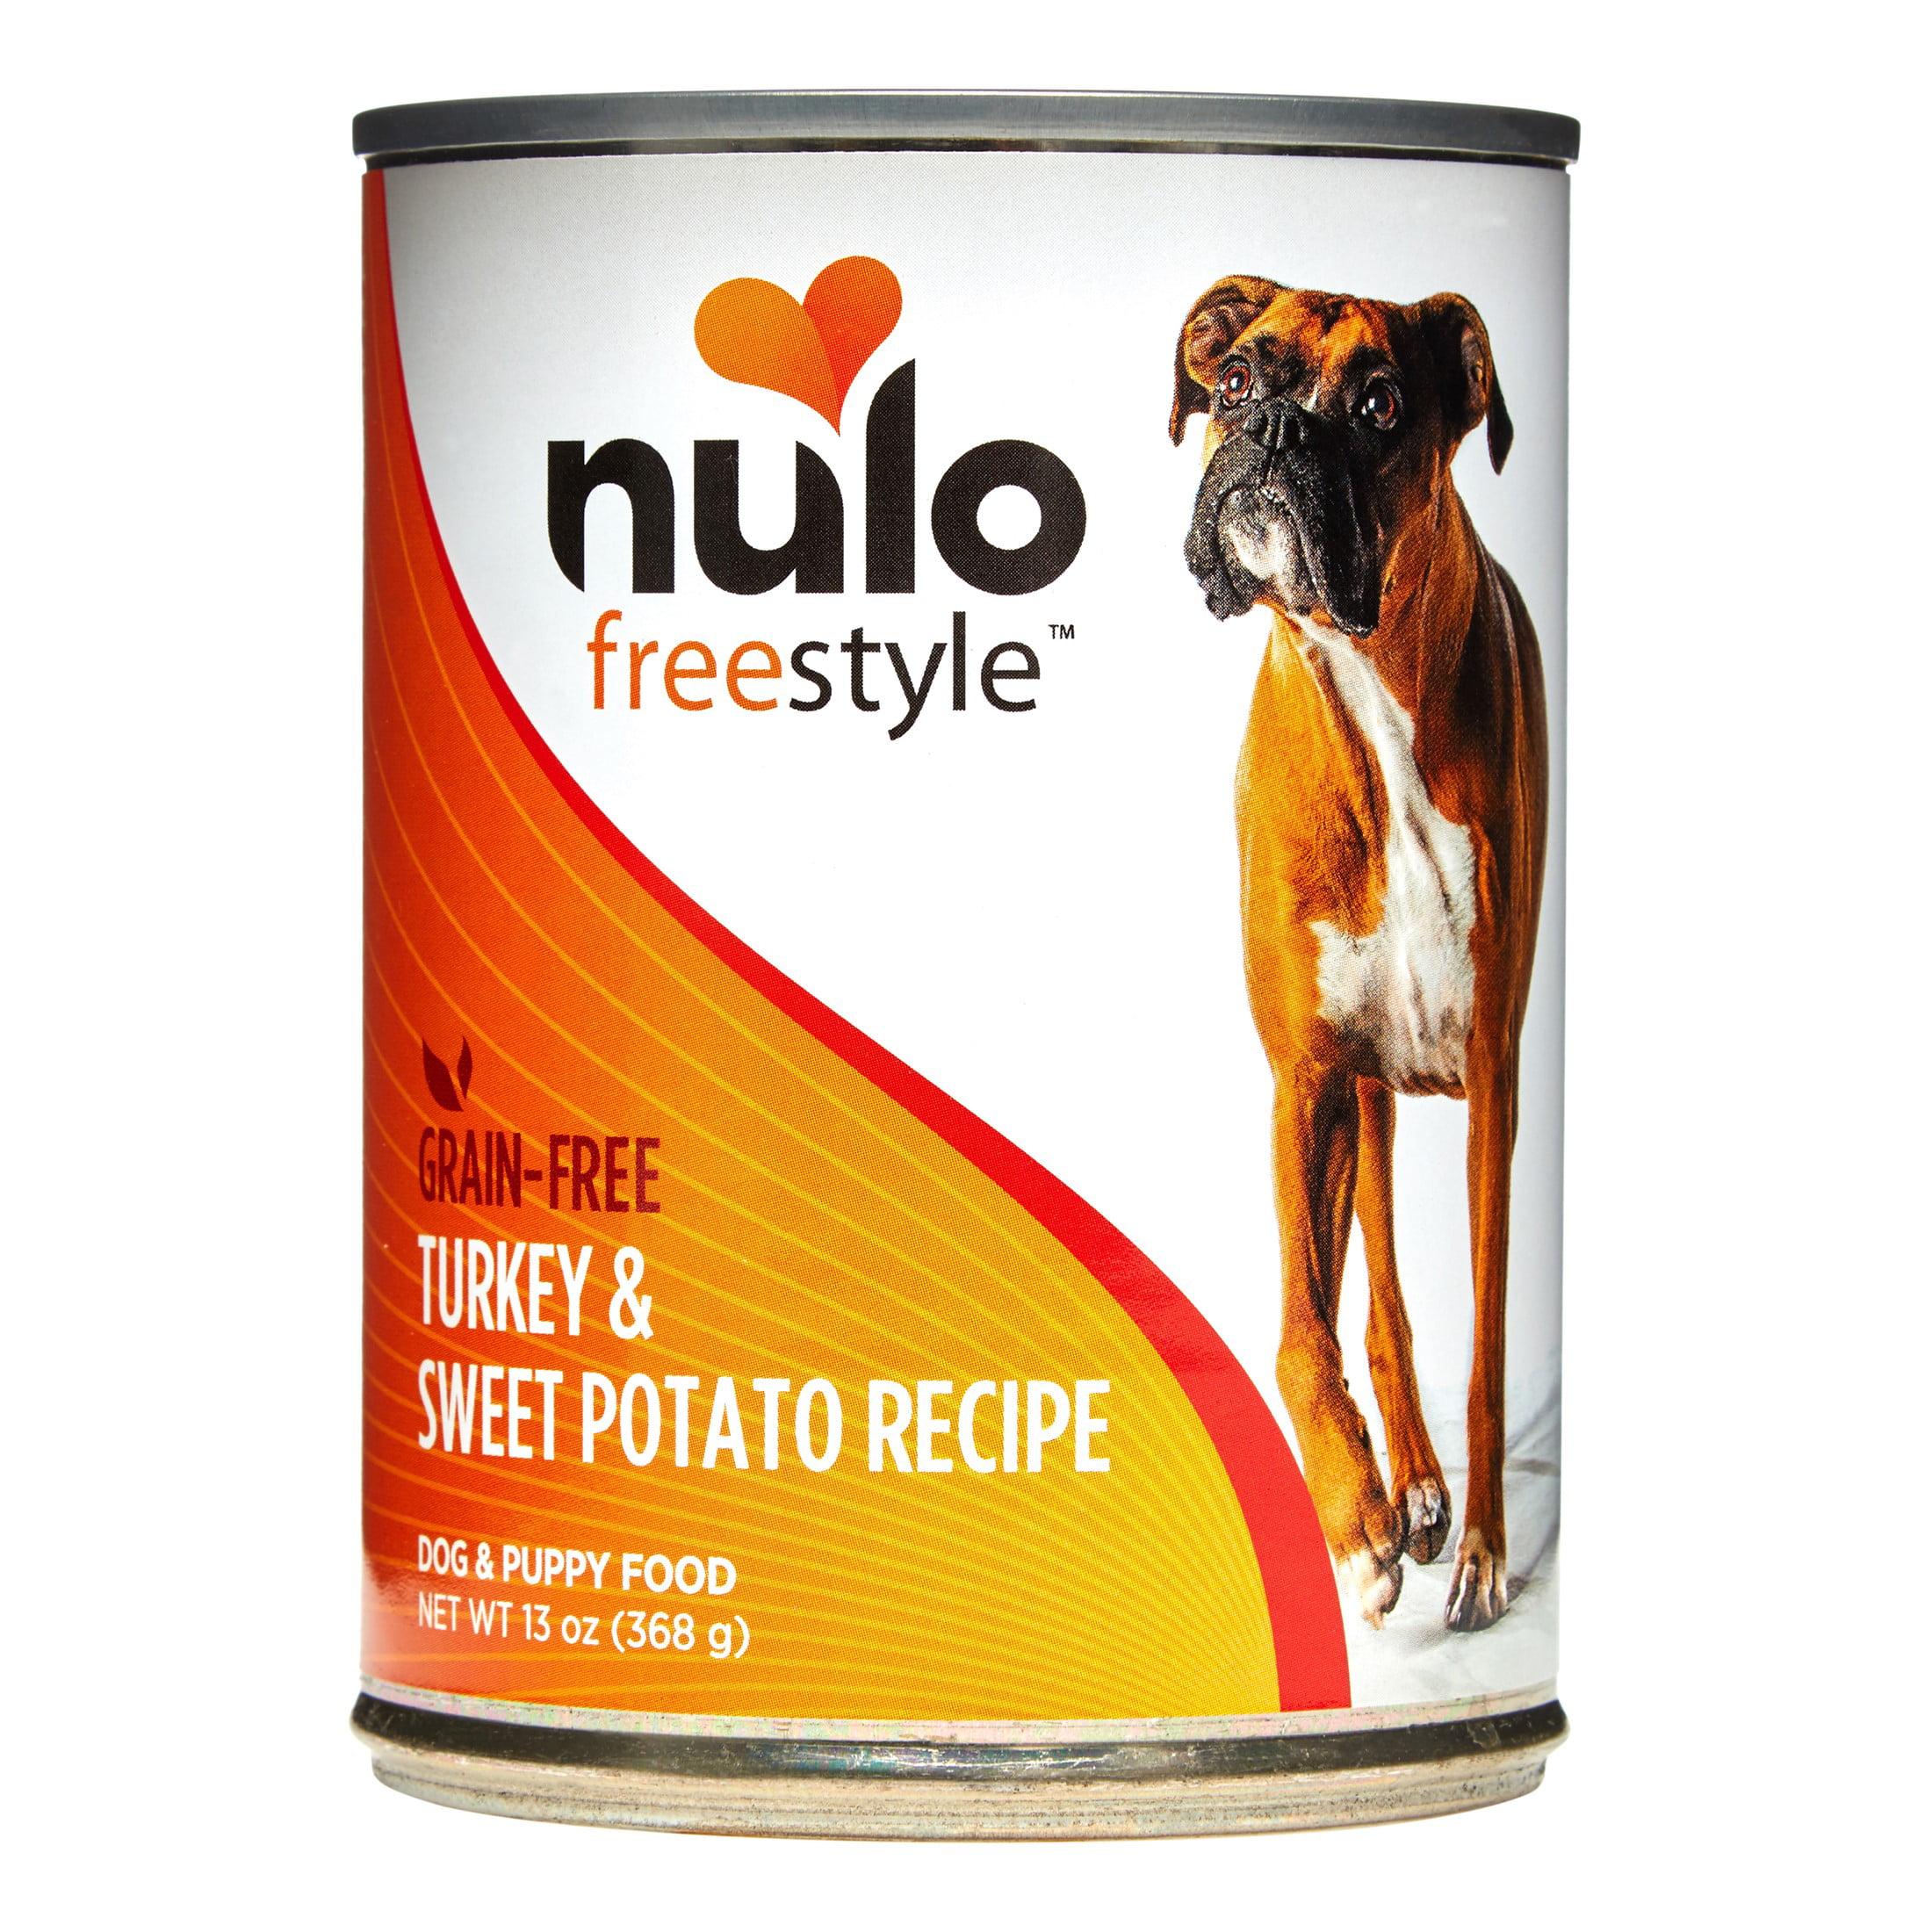 Nulo Freestyle Grain-Free Turkey & Sweet Potato Wet Dog Food, 13 Oz, Case of 12